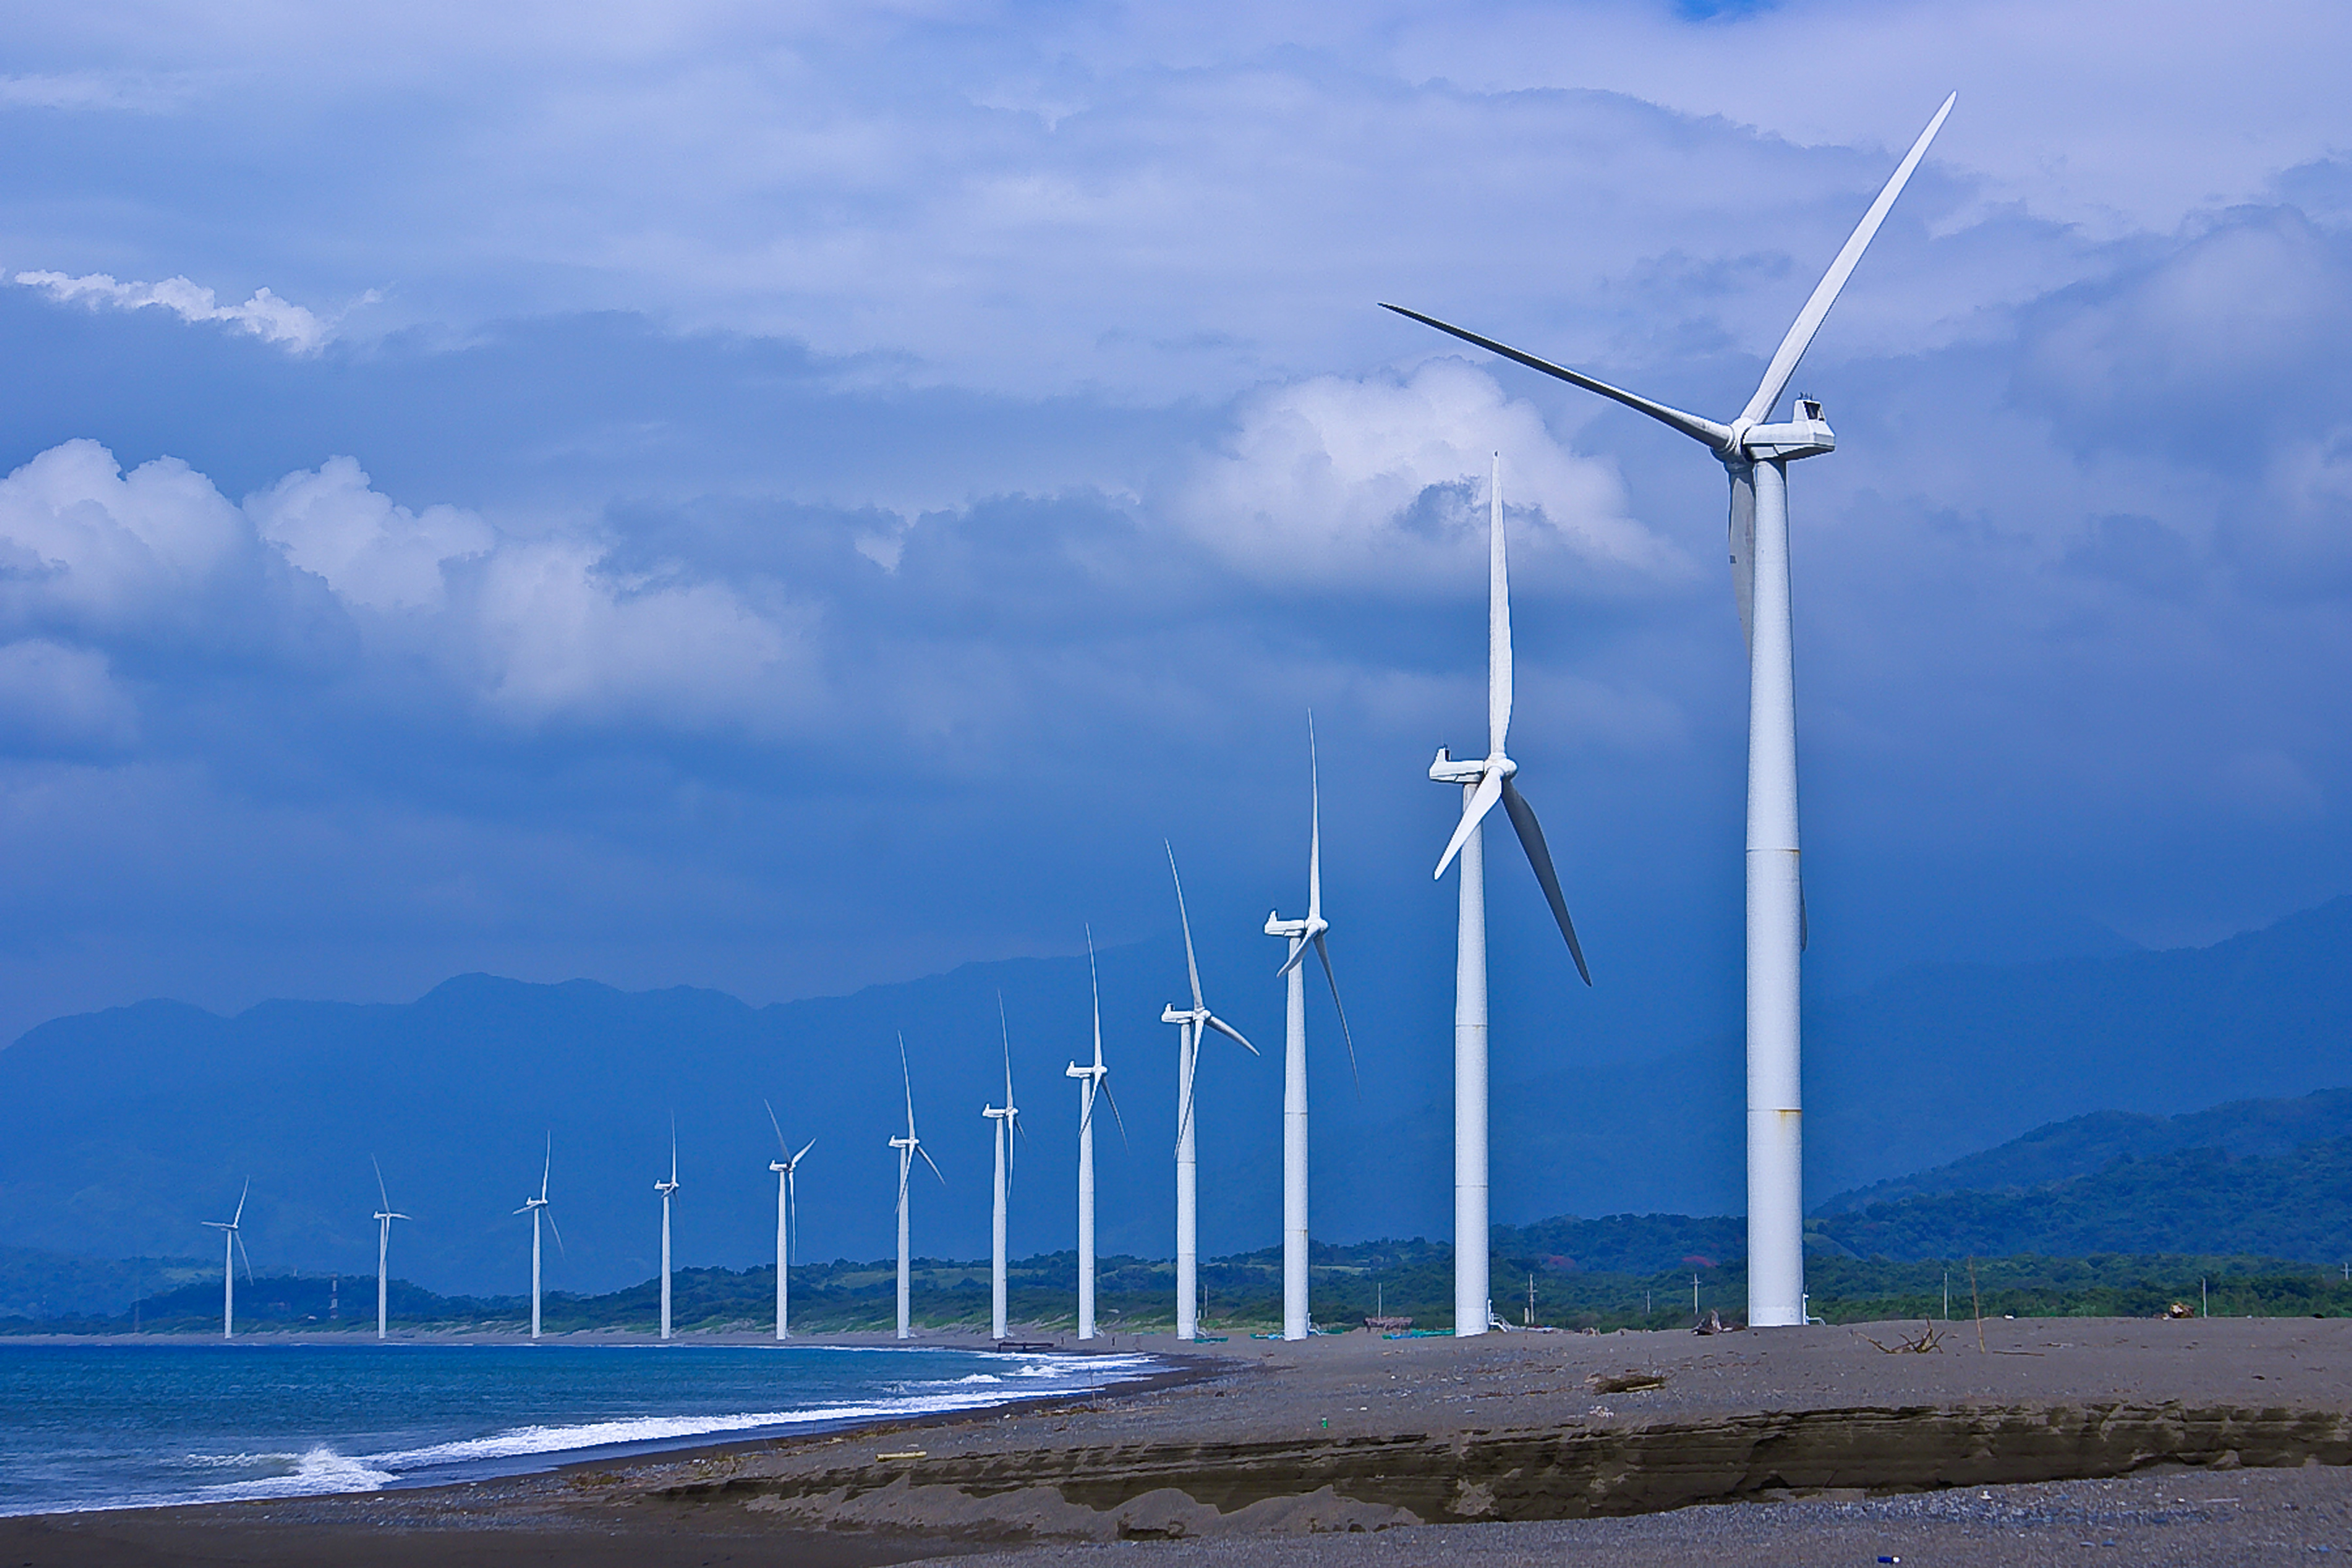 bangui windmills hd